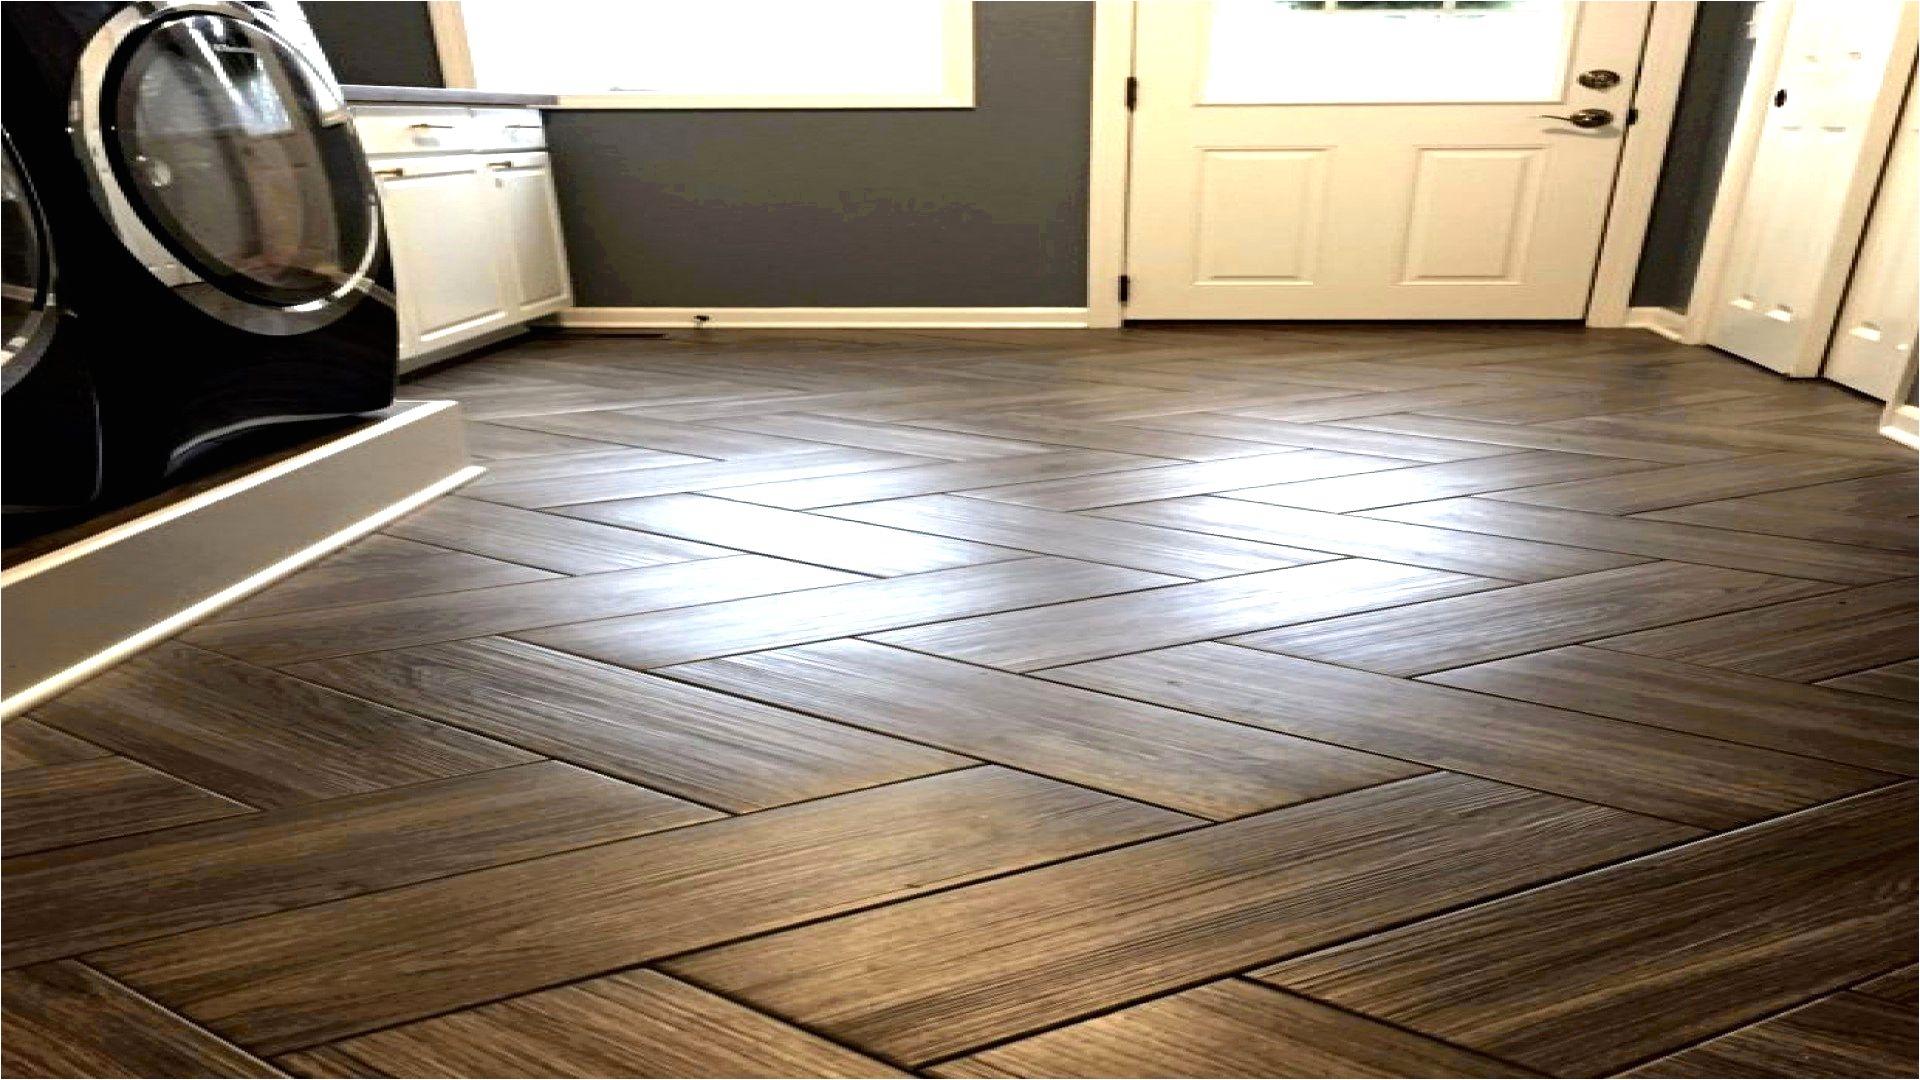 Asphalt Floor Tile Removal 40 How to Remove Vinyl Floor Tile Inspiration